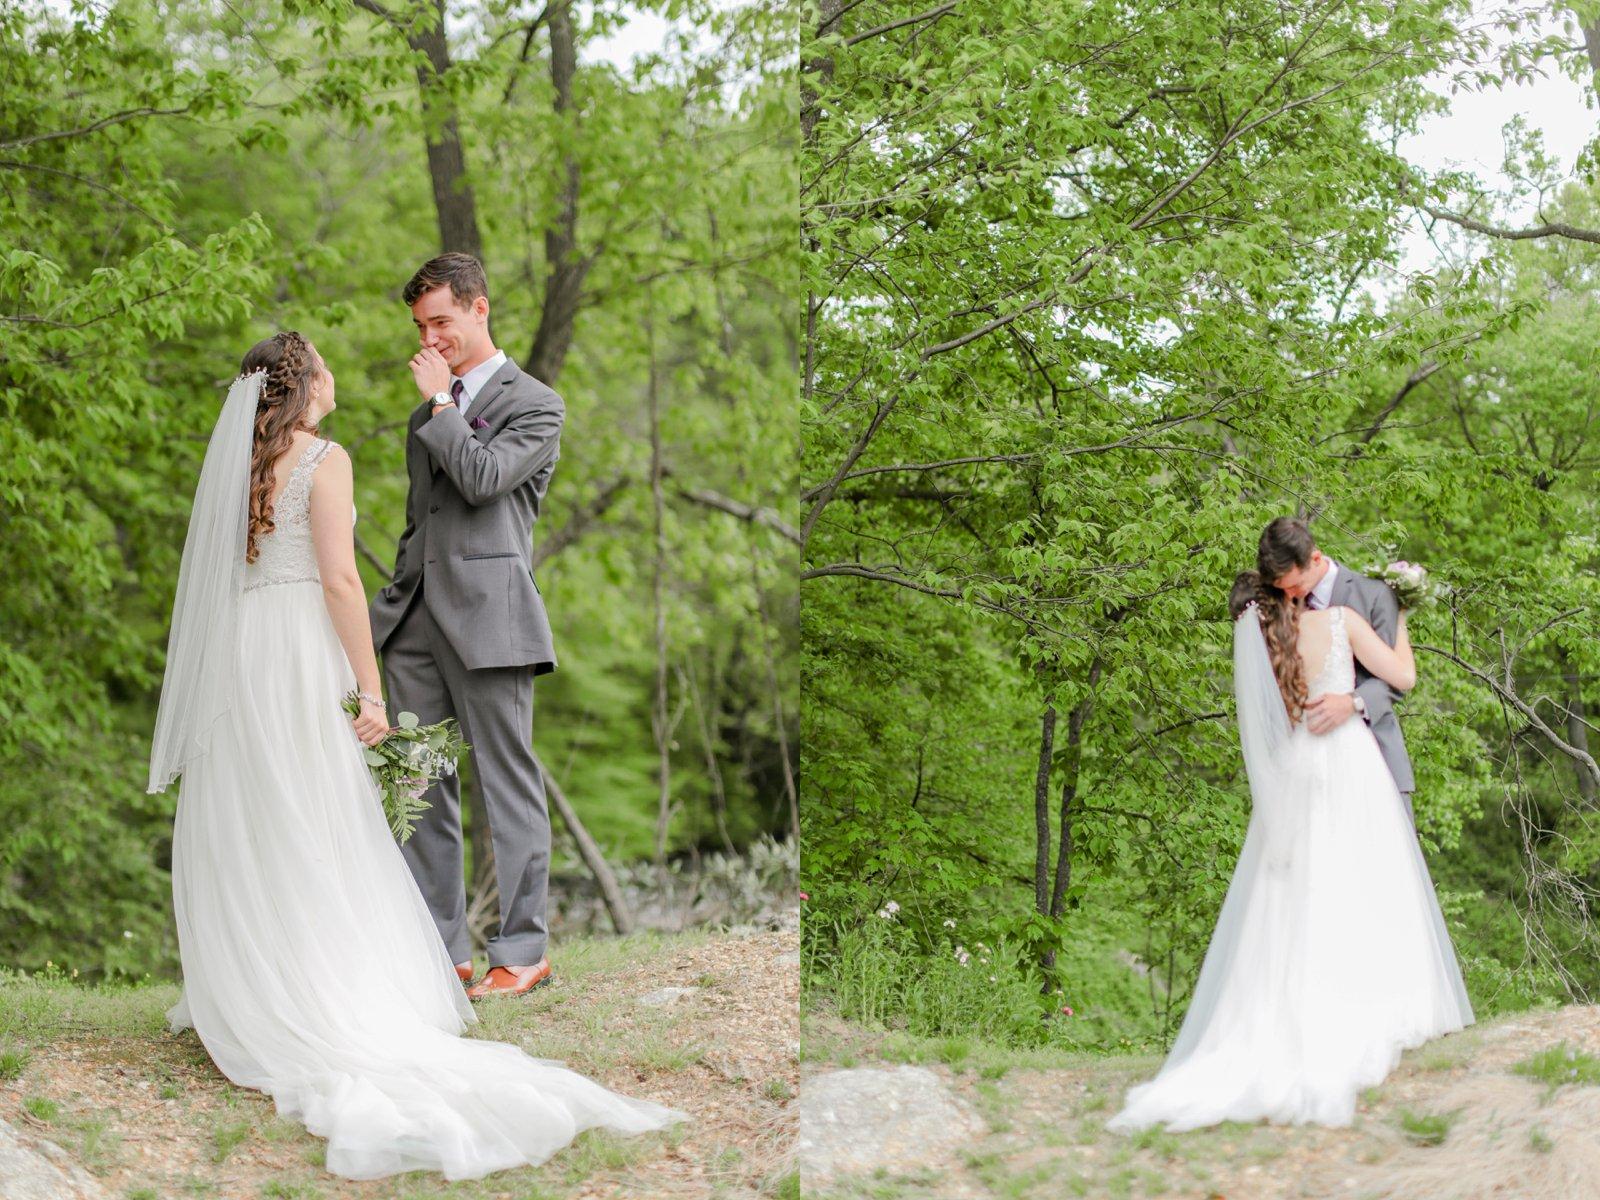 wedding_photographer_Missouri_Destination_elope_intimate_Saint_James_MO_Missouri_KansasCity_Jeff_City_Jefferson_Columbia_Engagement_Photos_Pictures_Session_Best_Videographer_0162.jpg